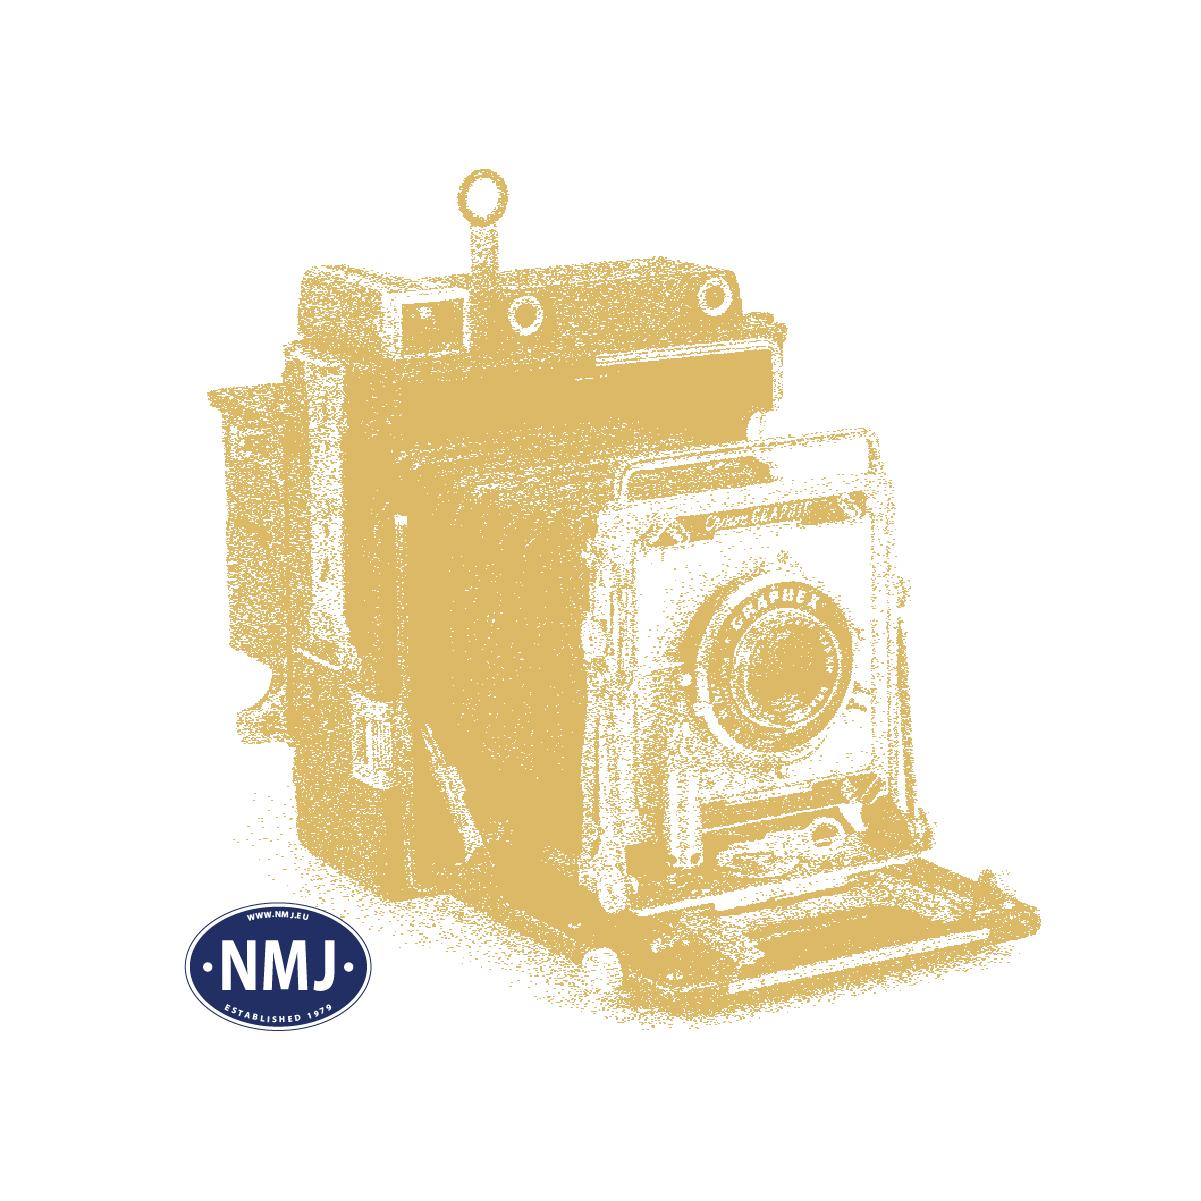 NMJT101.304 - NMJ Topline NSB WLABK 21080 Nydesign